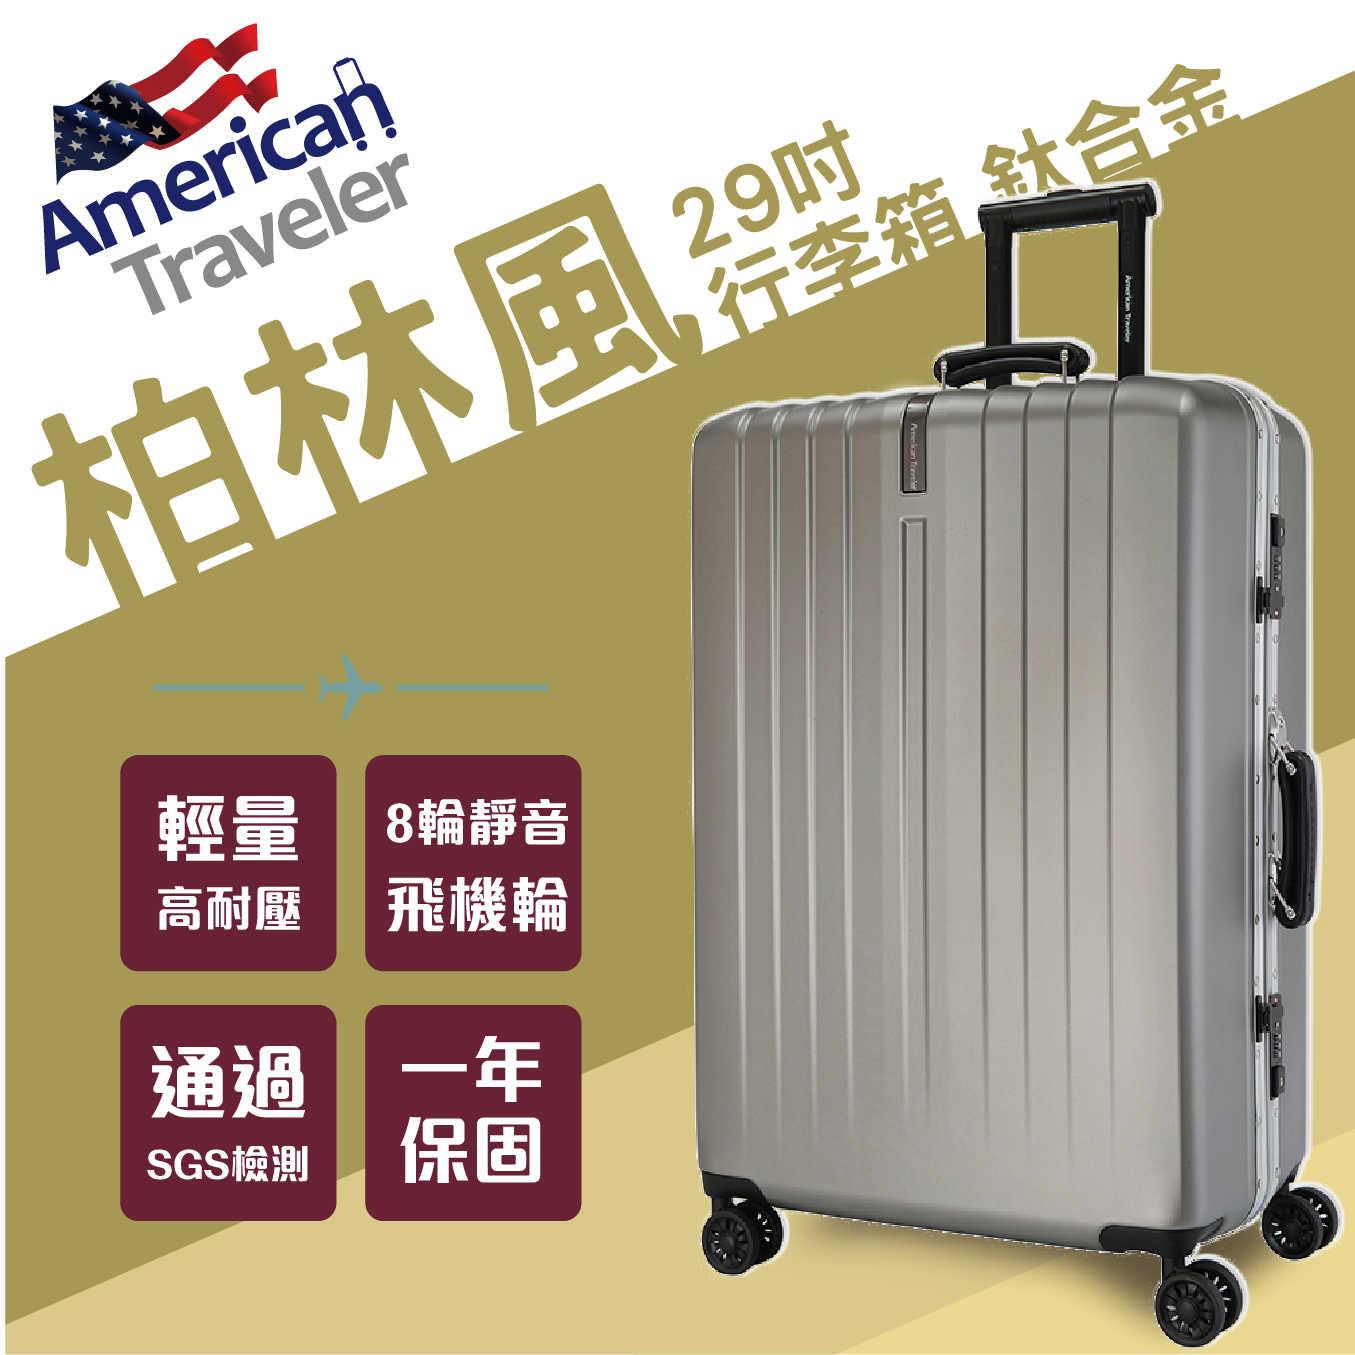 [American Traveler] BER 柏林系列 – 29吋耐衝擊超輕大容量鋁框行李箱-金